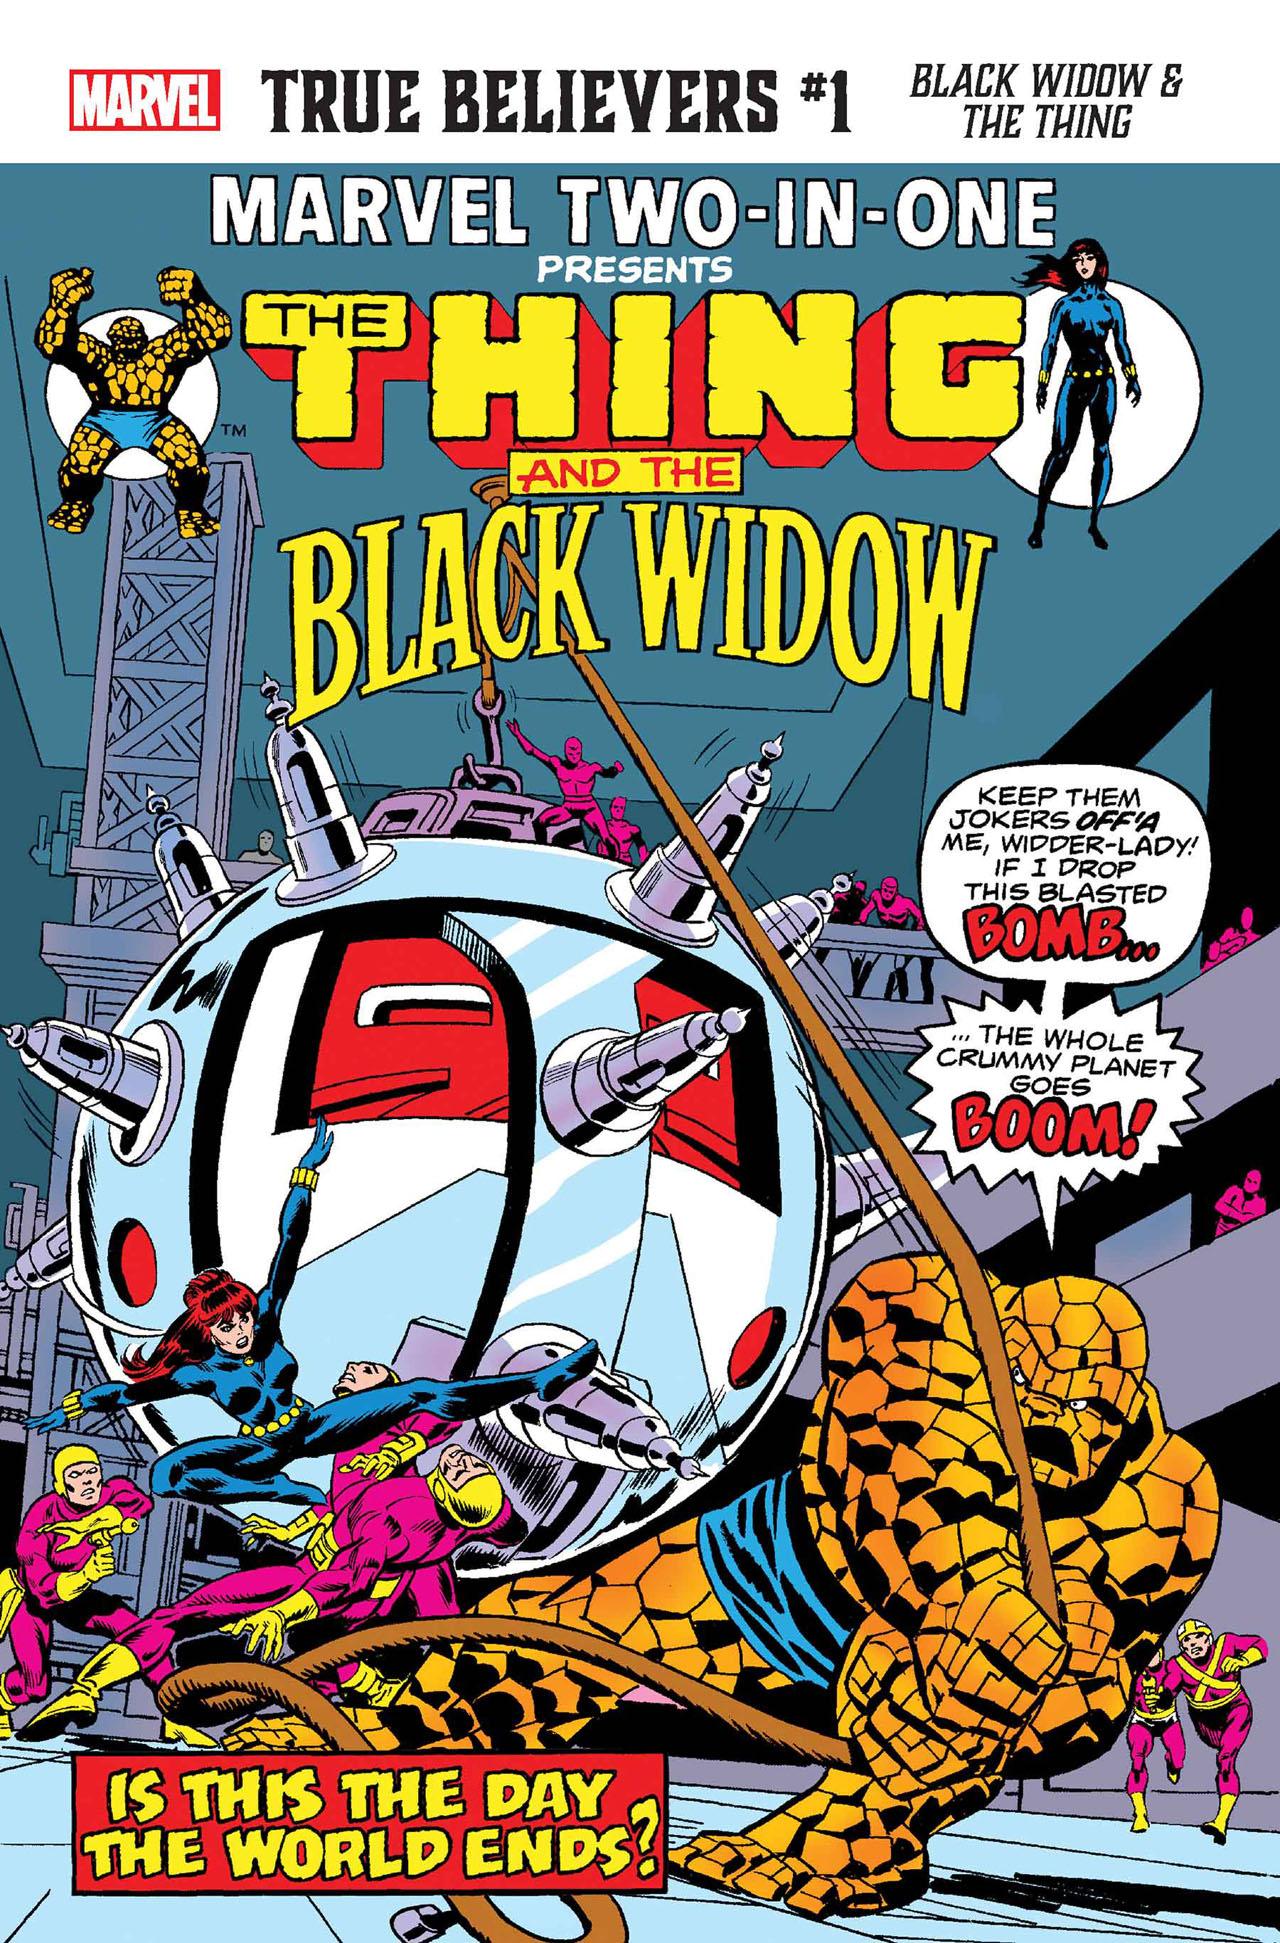 True Believers: Black Widow & the Thing Vol 1 1